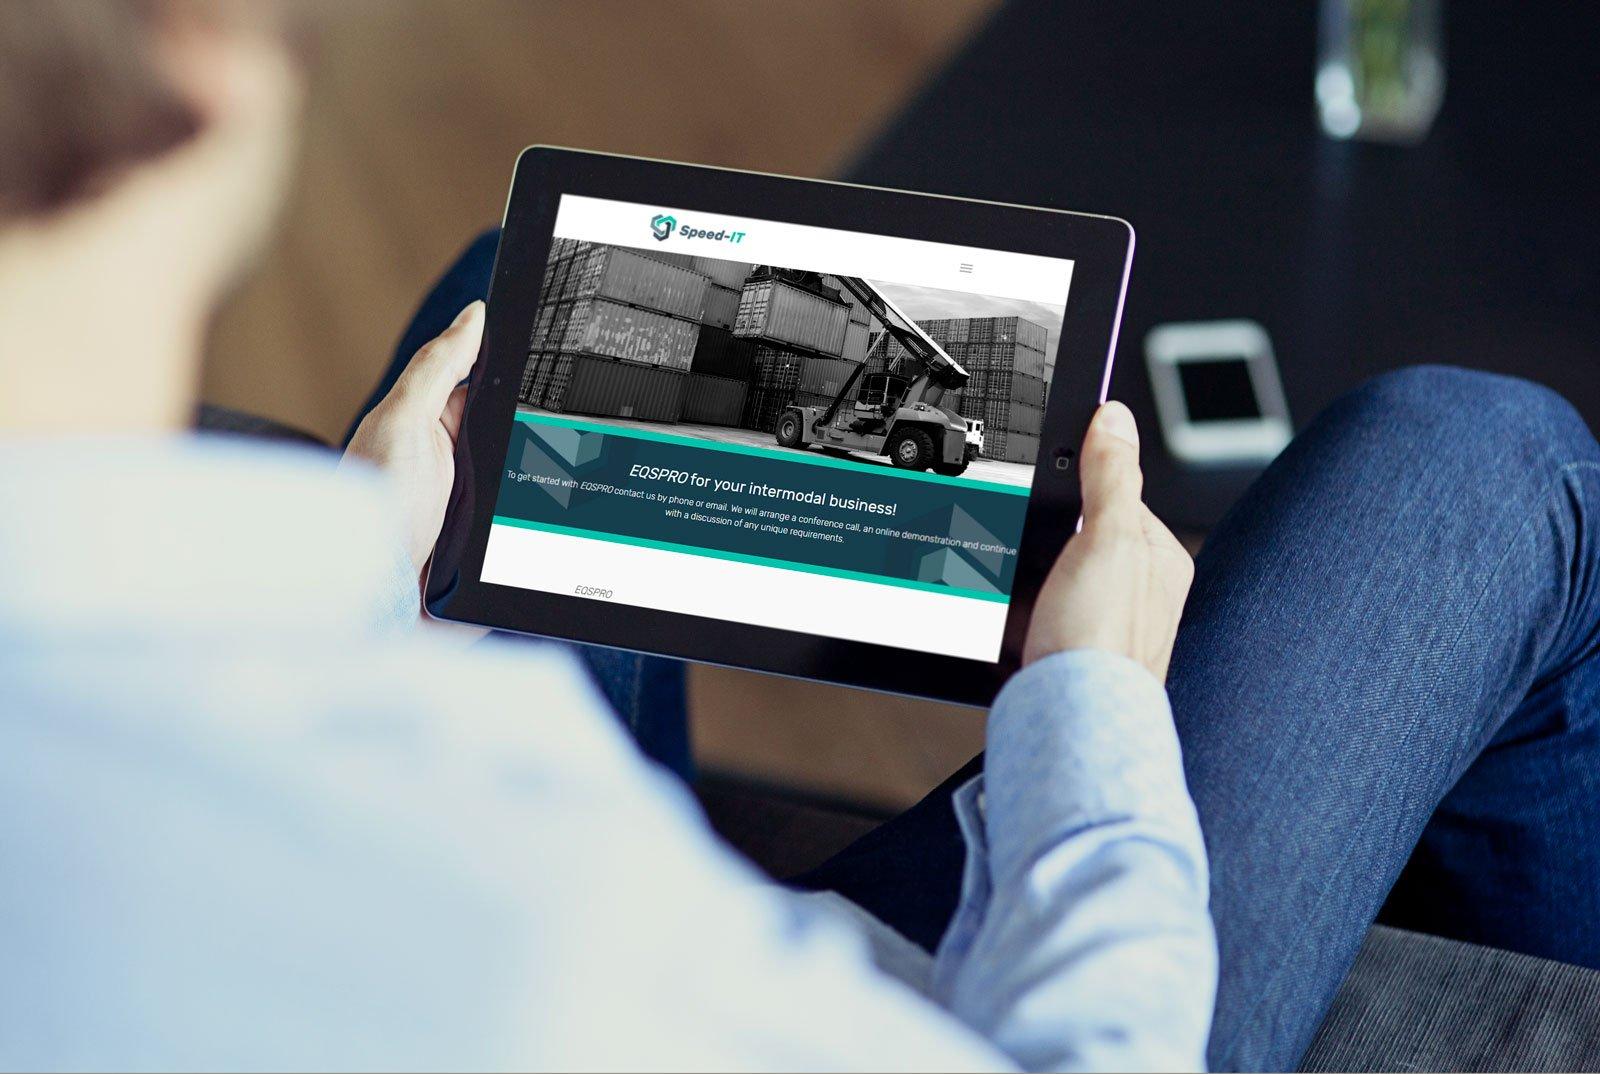 Speed IT mobile ready web Design and Branding Ireland